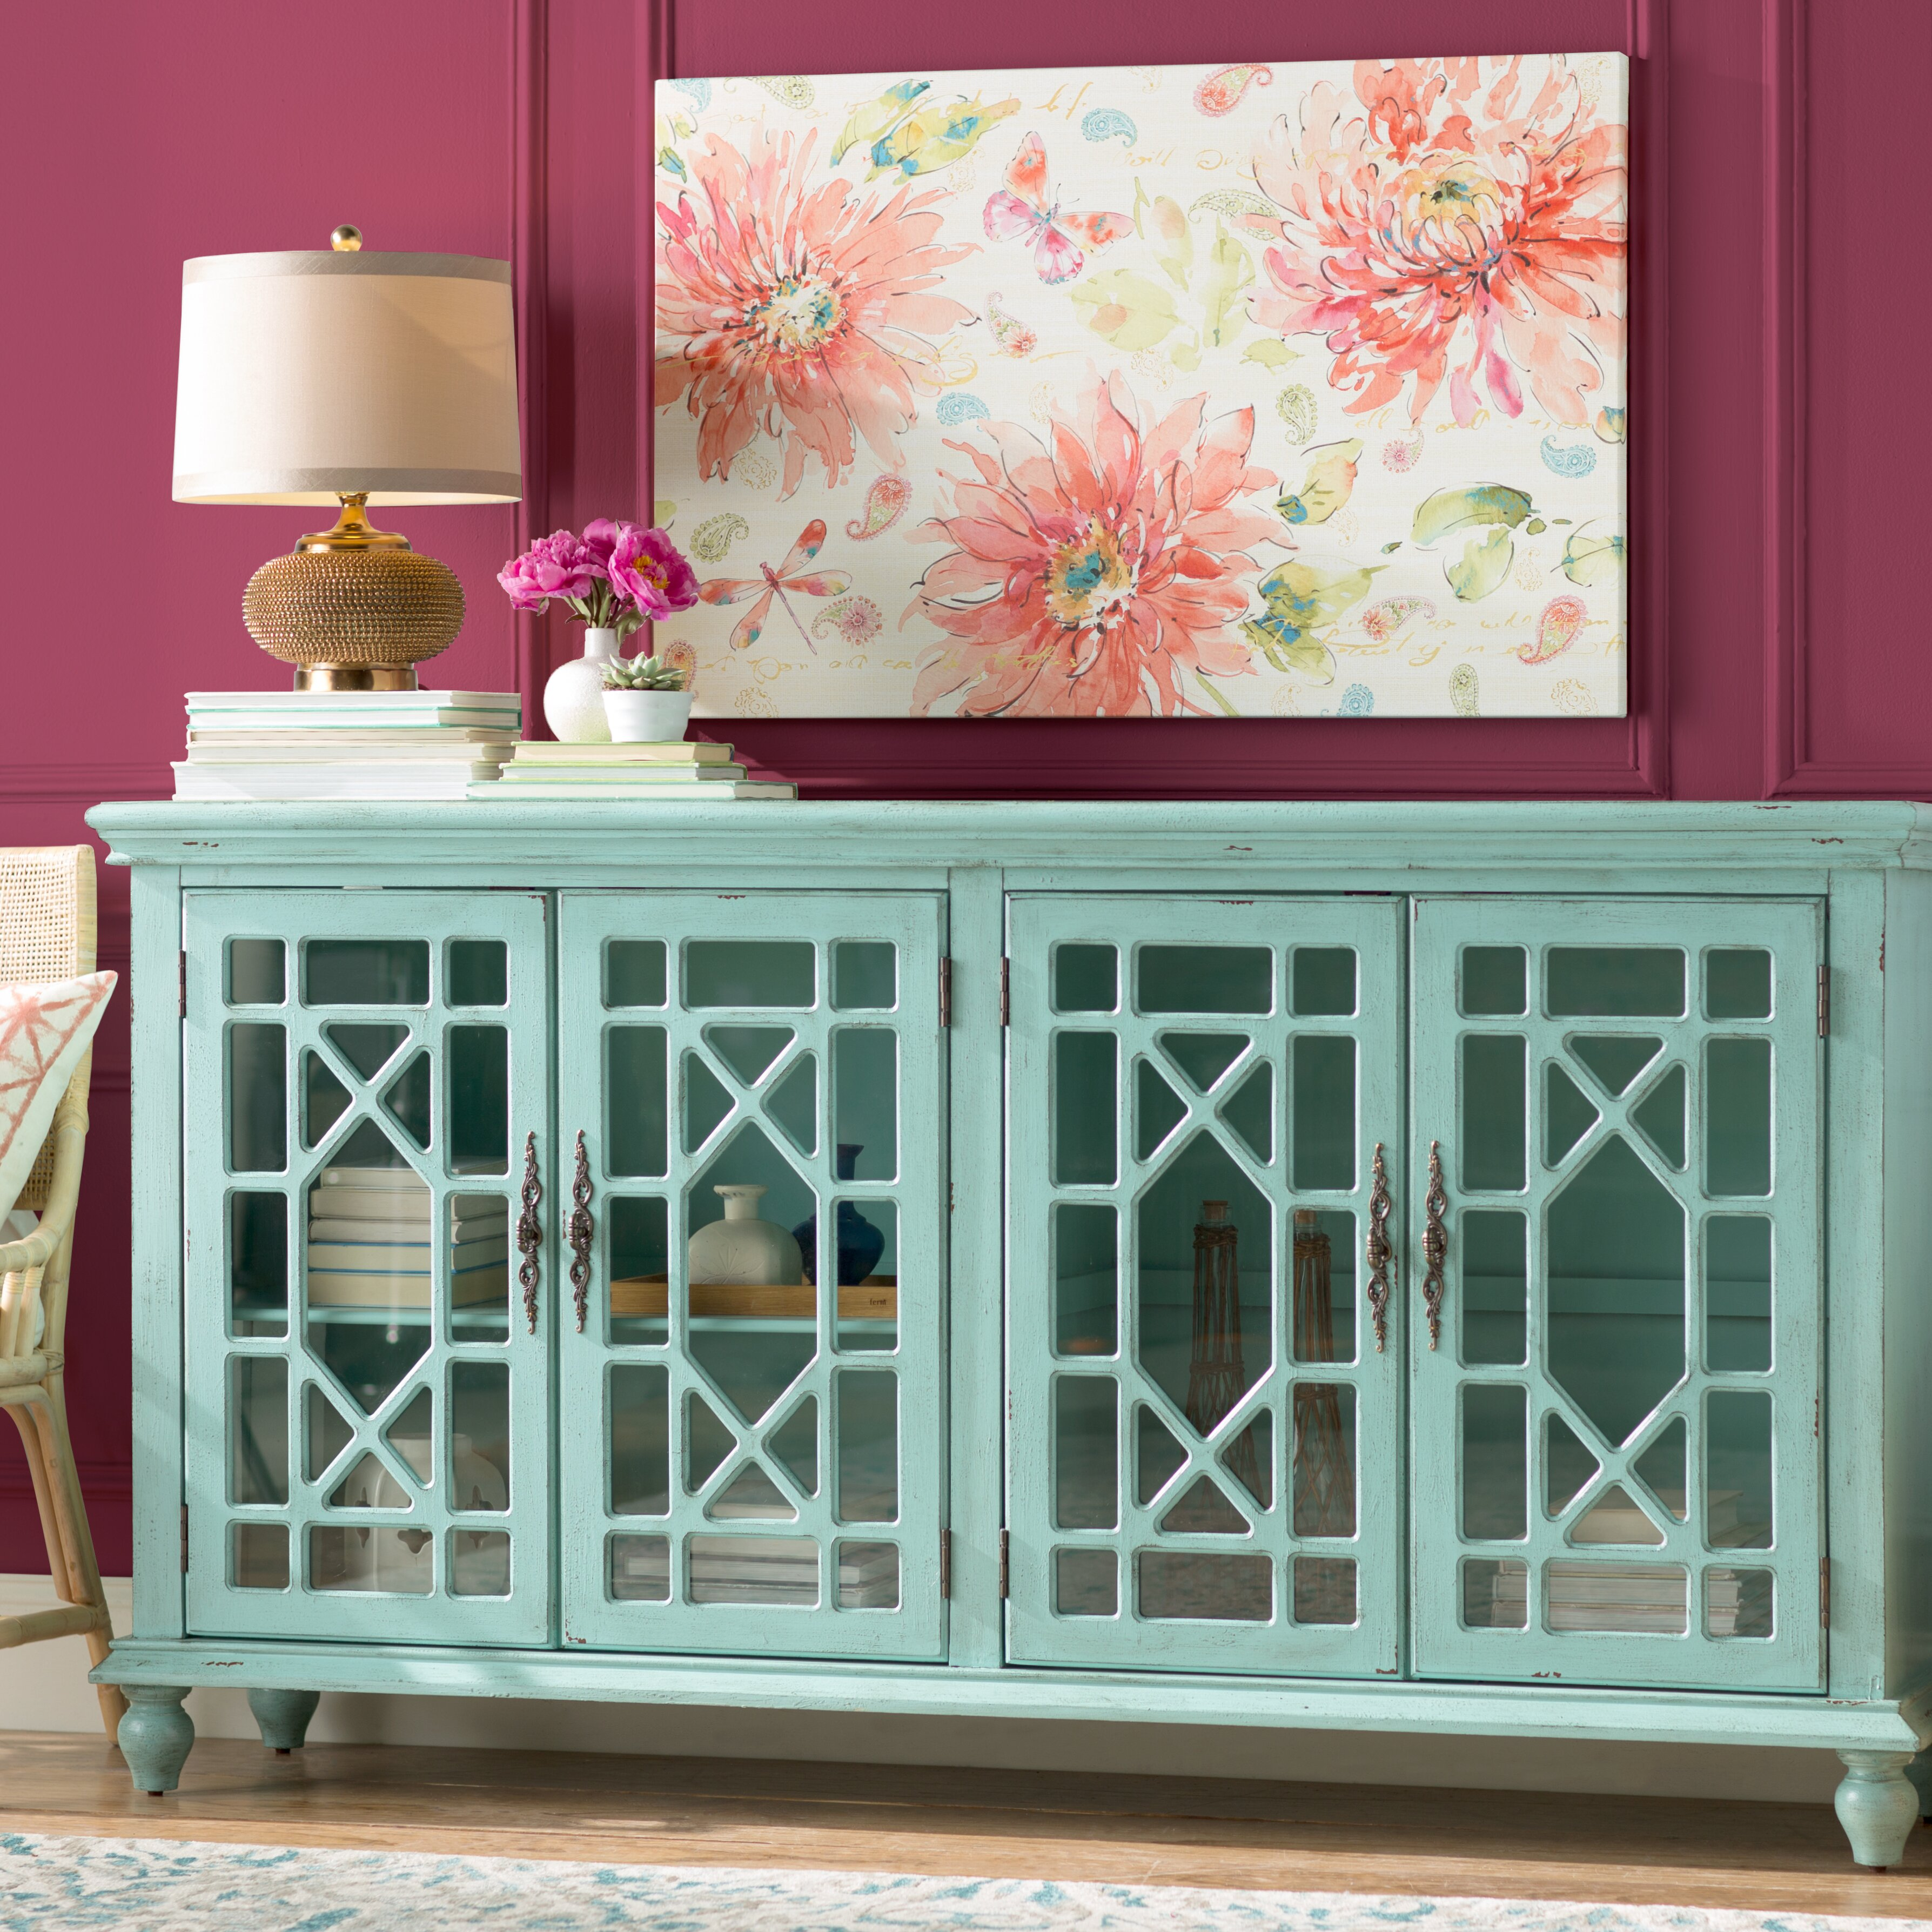 Bungalow Rose Navya Wood Storage Bedroom Bench Reviews: Bungalow Rose Mendenhall Whitlam Sideboard & Reviews